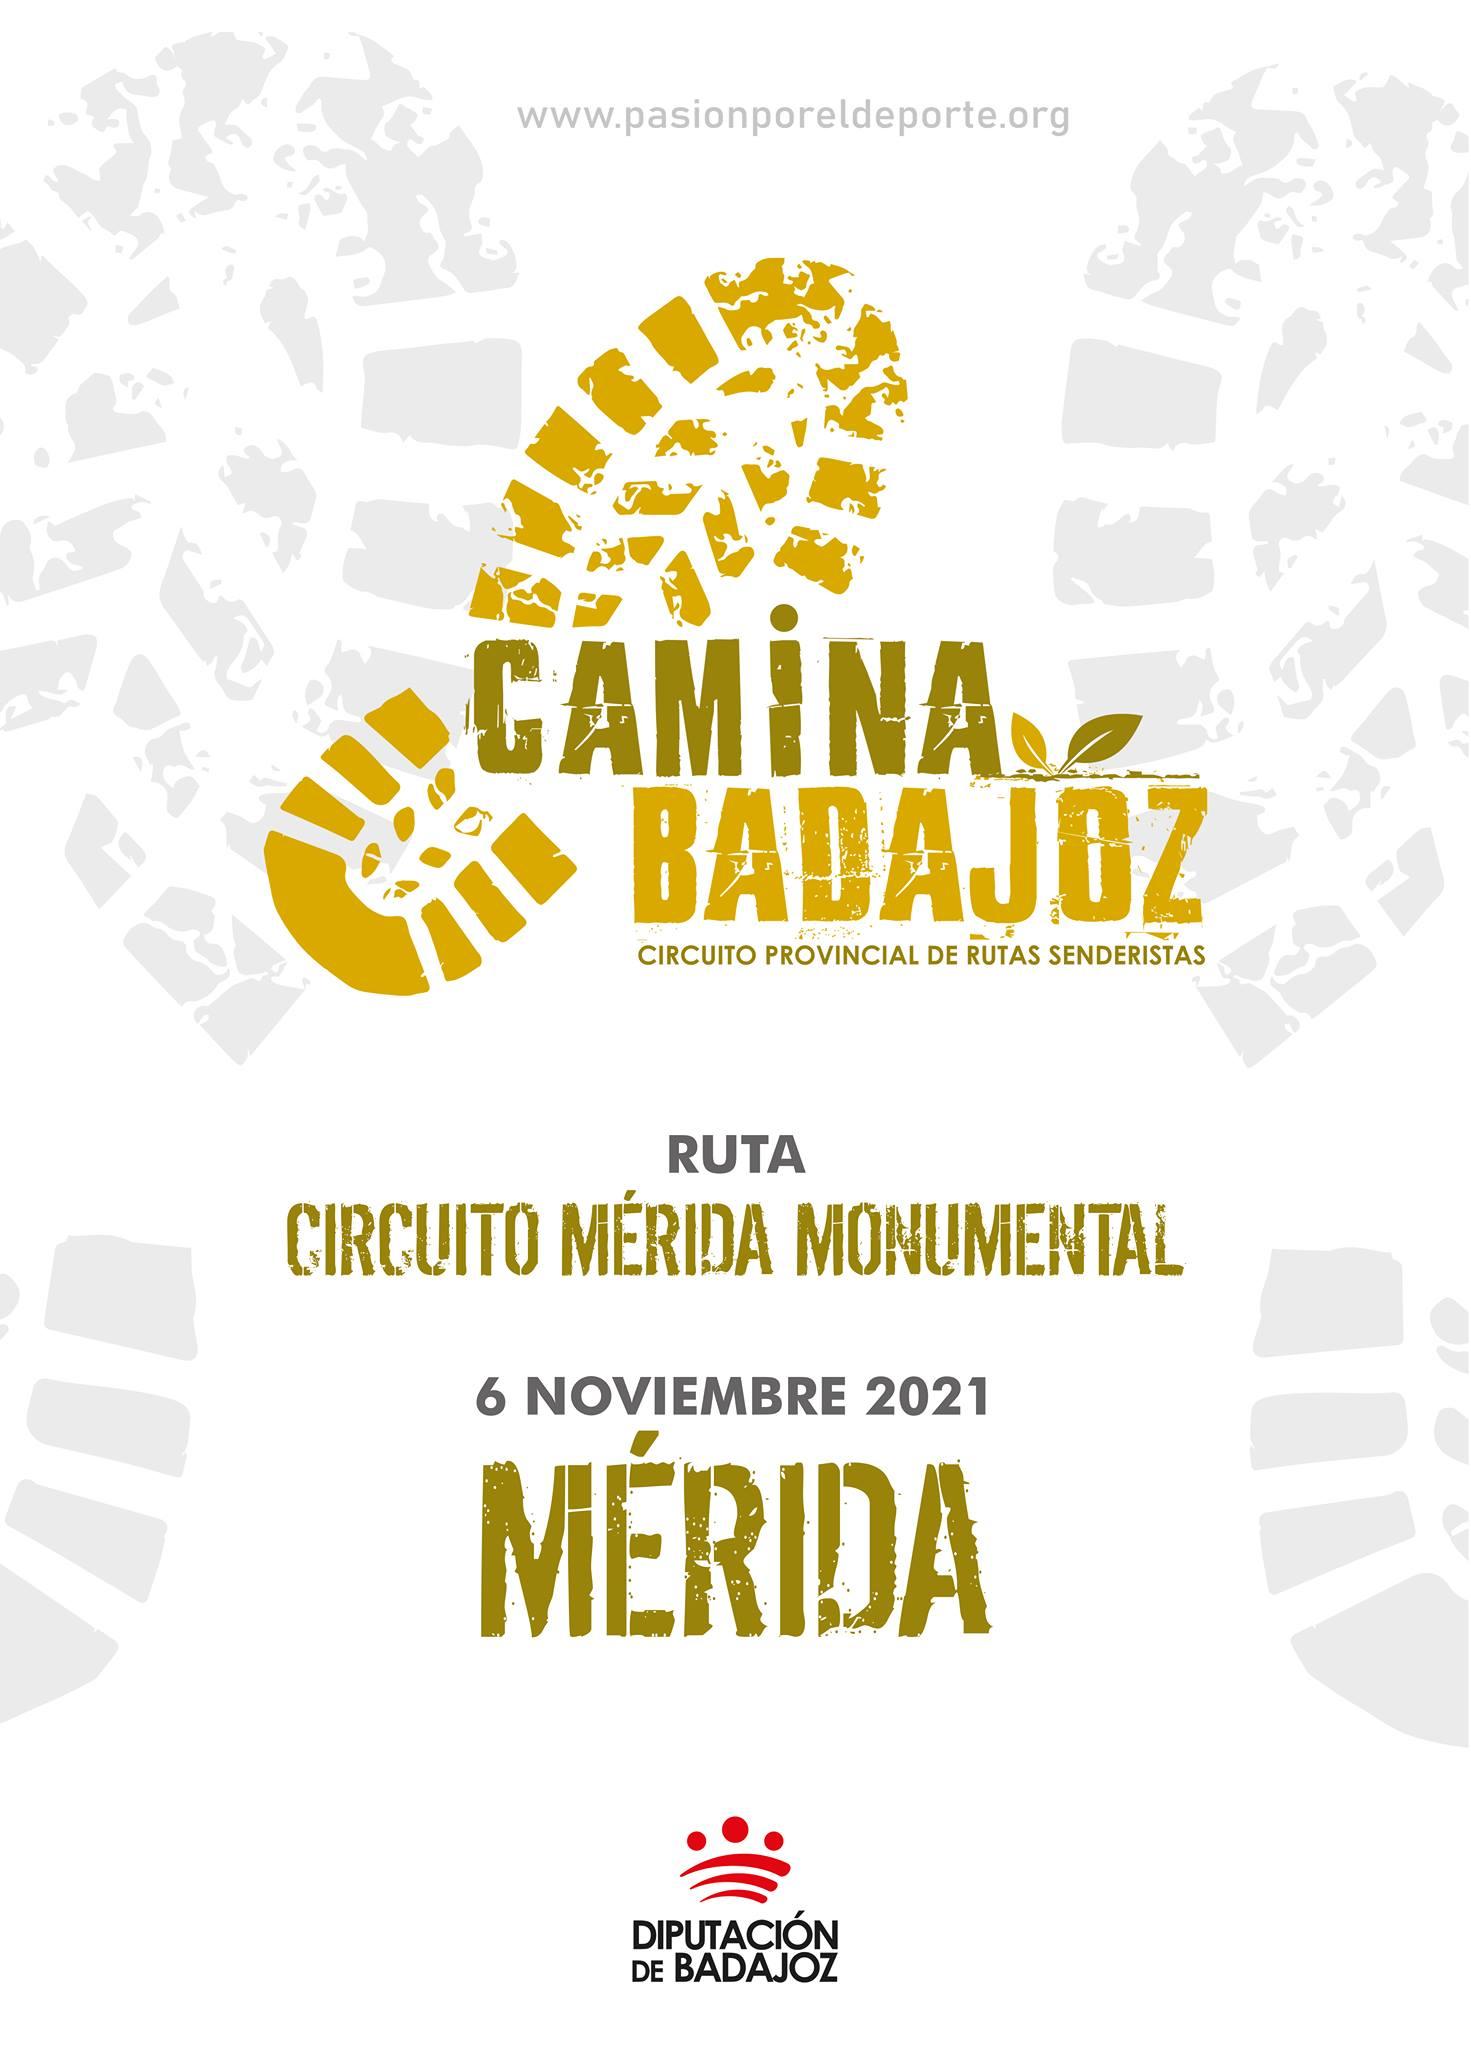 CAMINA BADAJOZ | Ruta Circuito Mérida Monumental (Mérida)